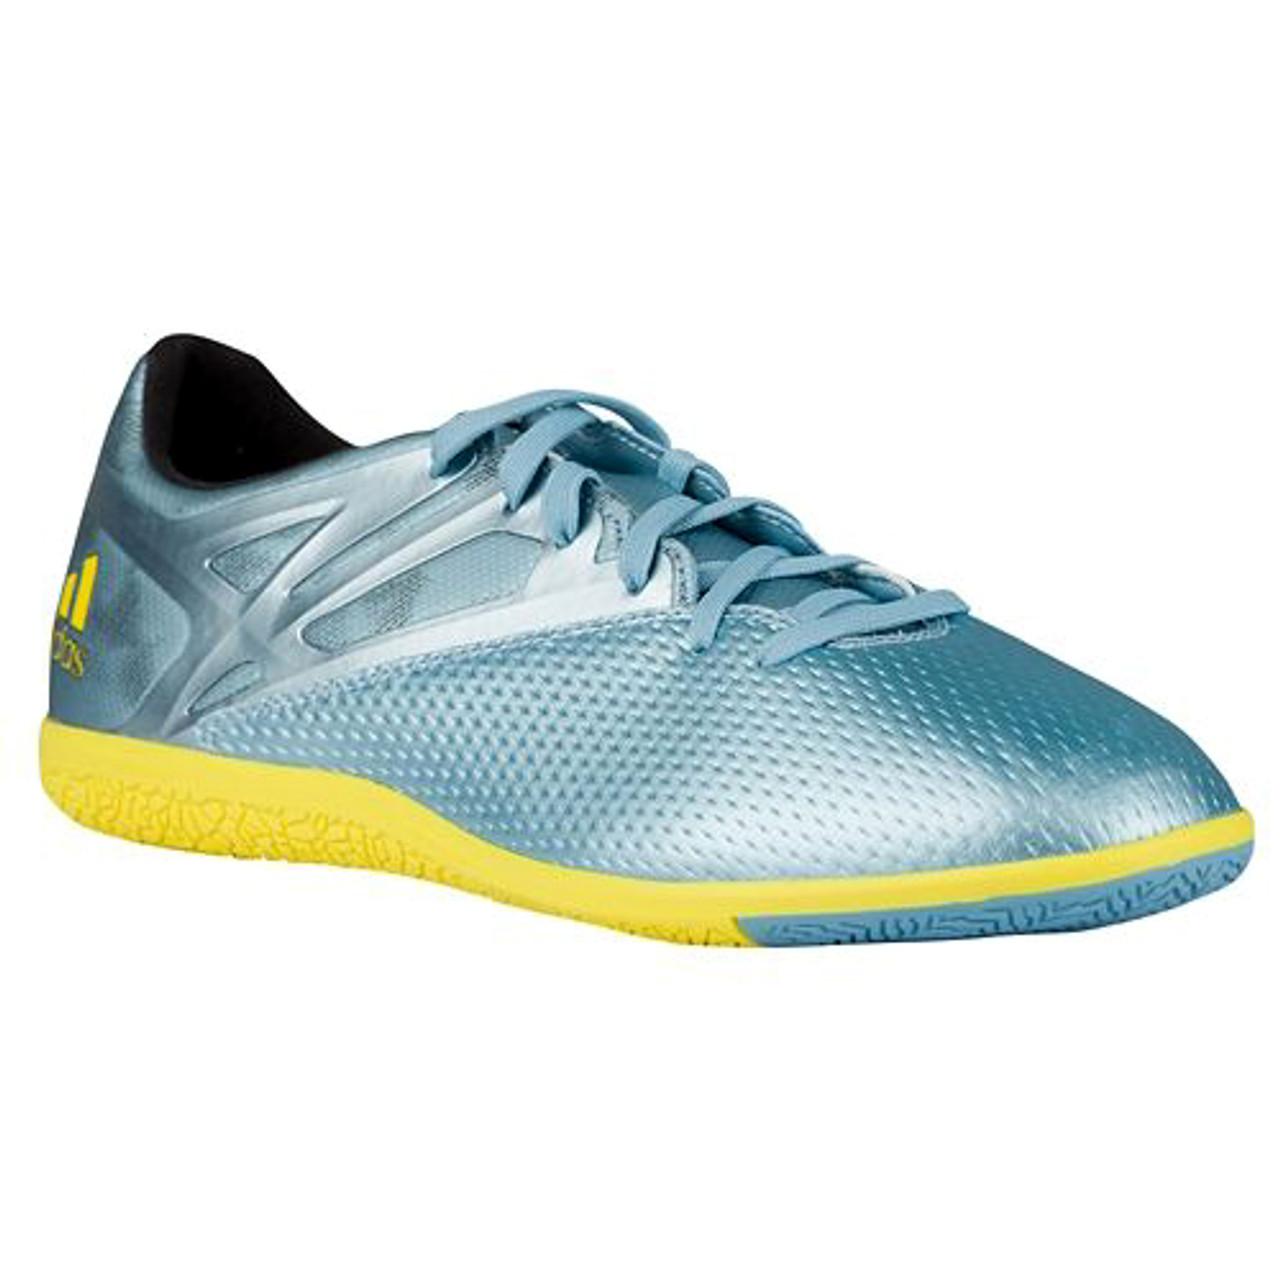 ADIDAS MESSI 15.3 IN - Matt Ice Metallic  Bright Yellow - Soccer Plus d0e2eab68